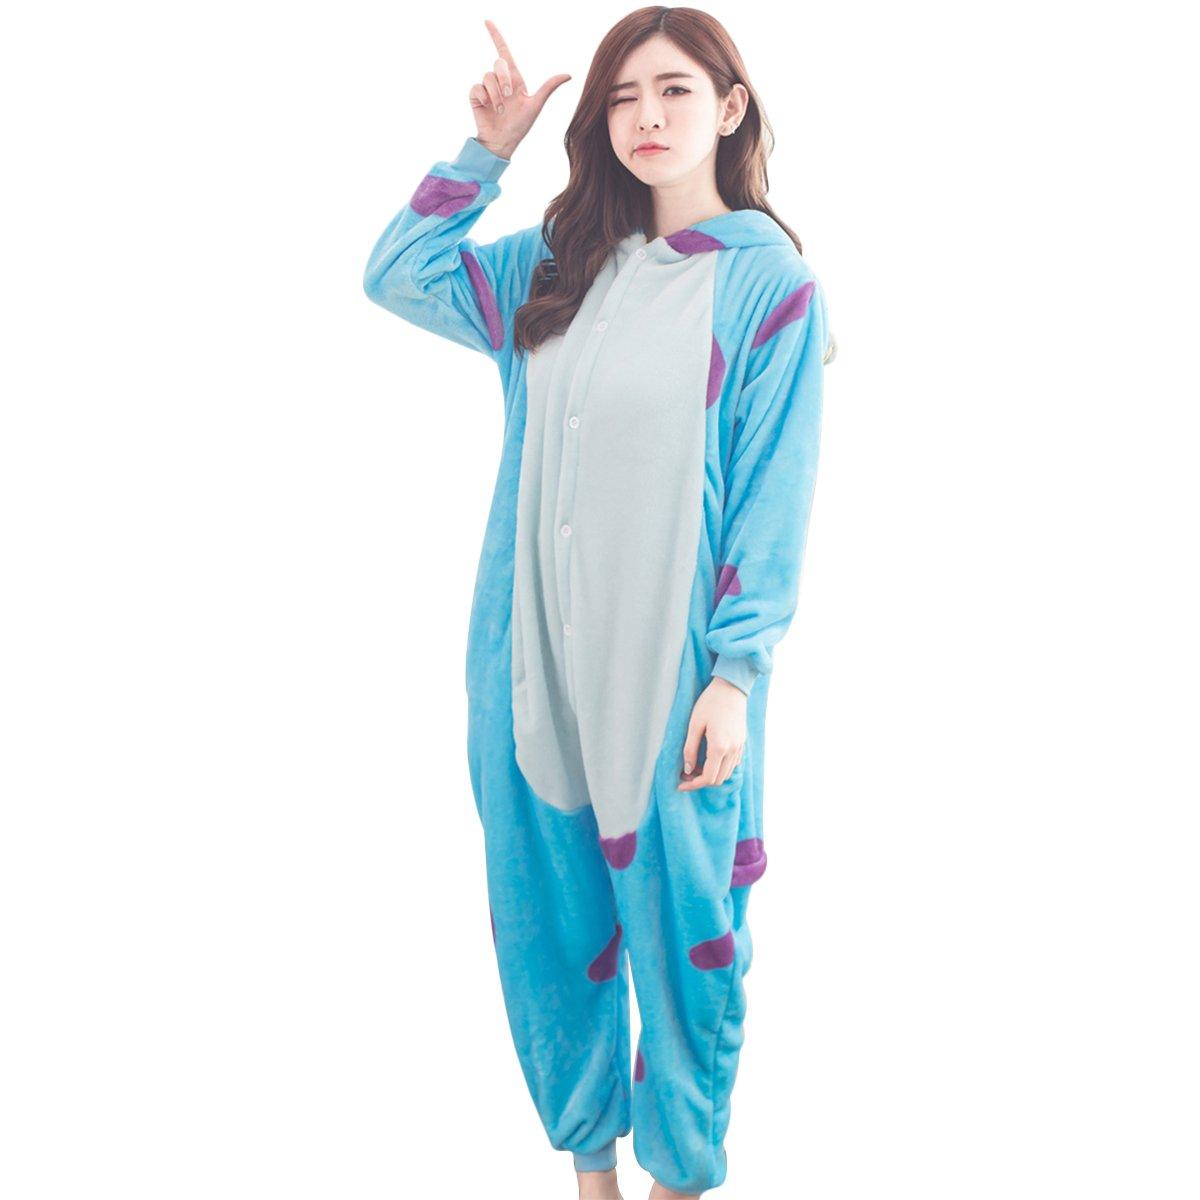 PADGENE Pyjama Animaux Cosplay Halloween Déguisement Adulte Femme Homme Unisexe, Ane, Small 09SGYF33-LZ-S